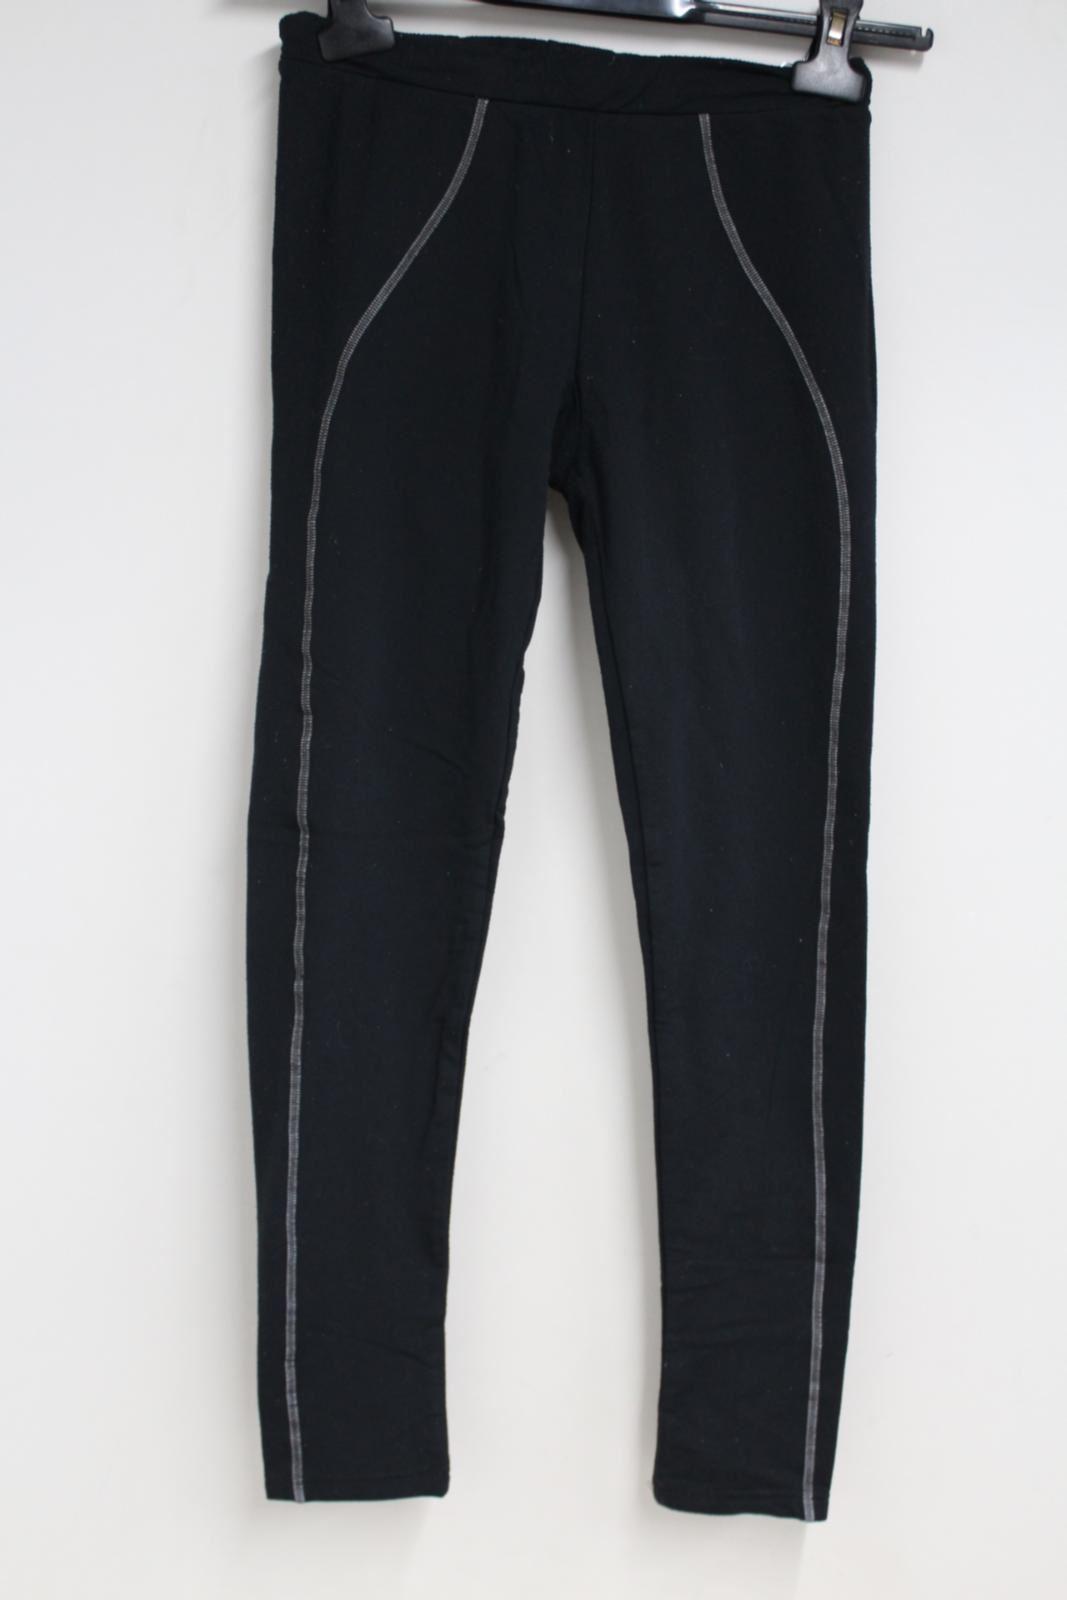 Sweaty-Betty-Ladies-Negro-Chandal-Activewear-Fitness-Leggings-Talla-S-W24-L26